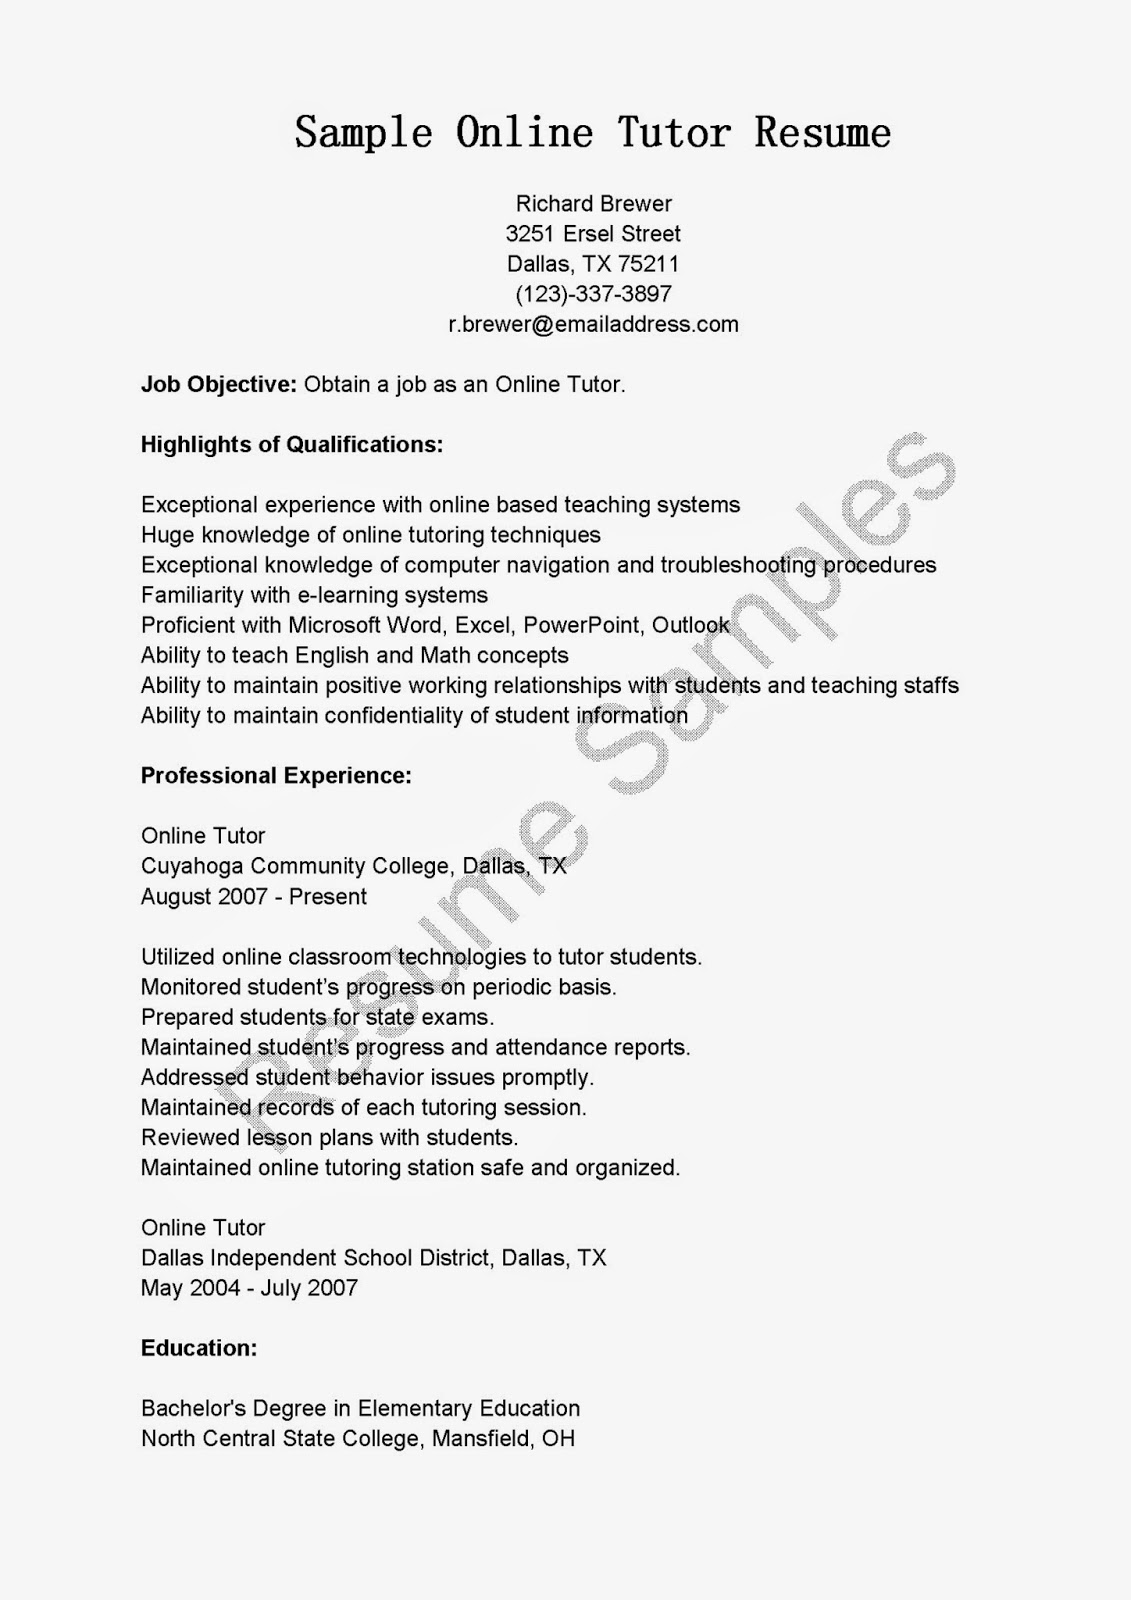 Resume Samples Paraprofessional Tutor Resume Sample